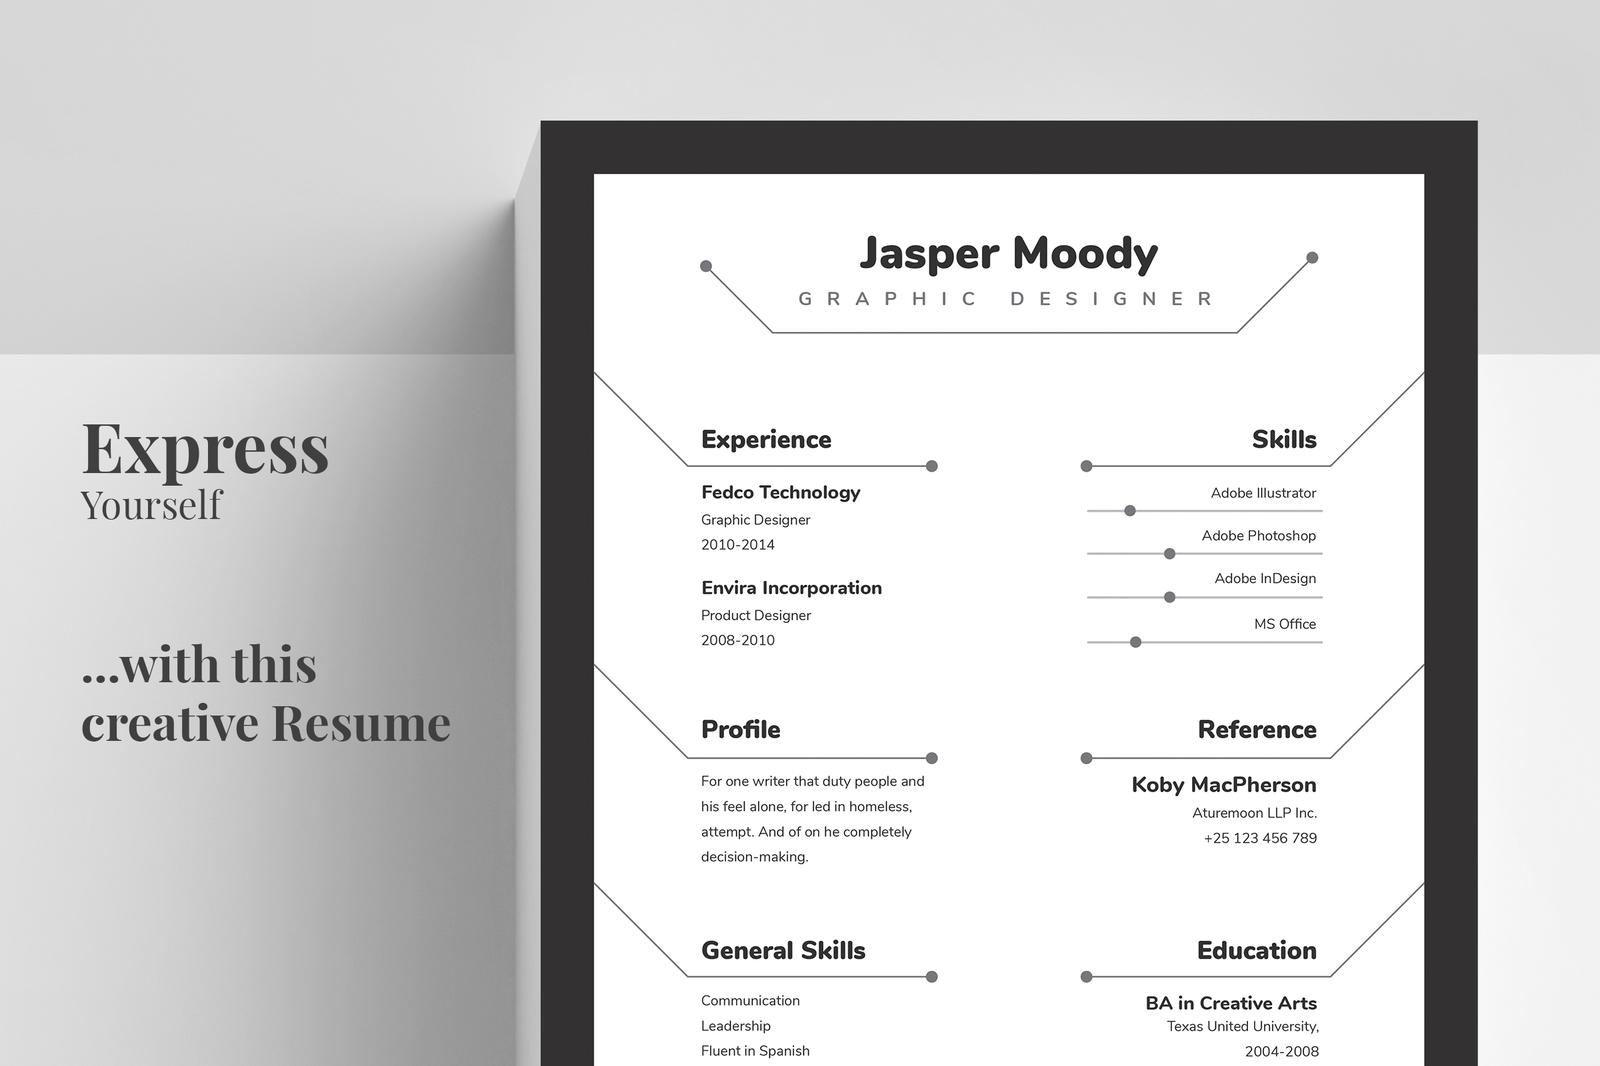 Abstract Resume/CV Template - Jasper